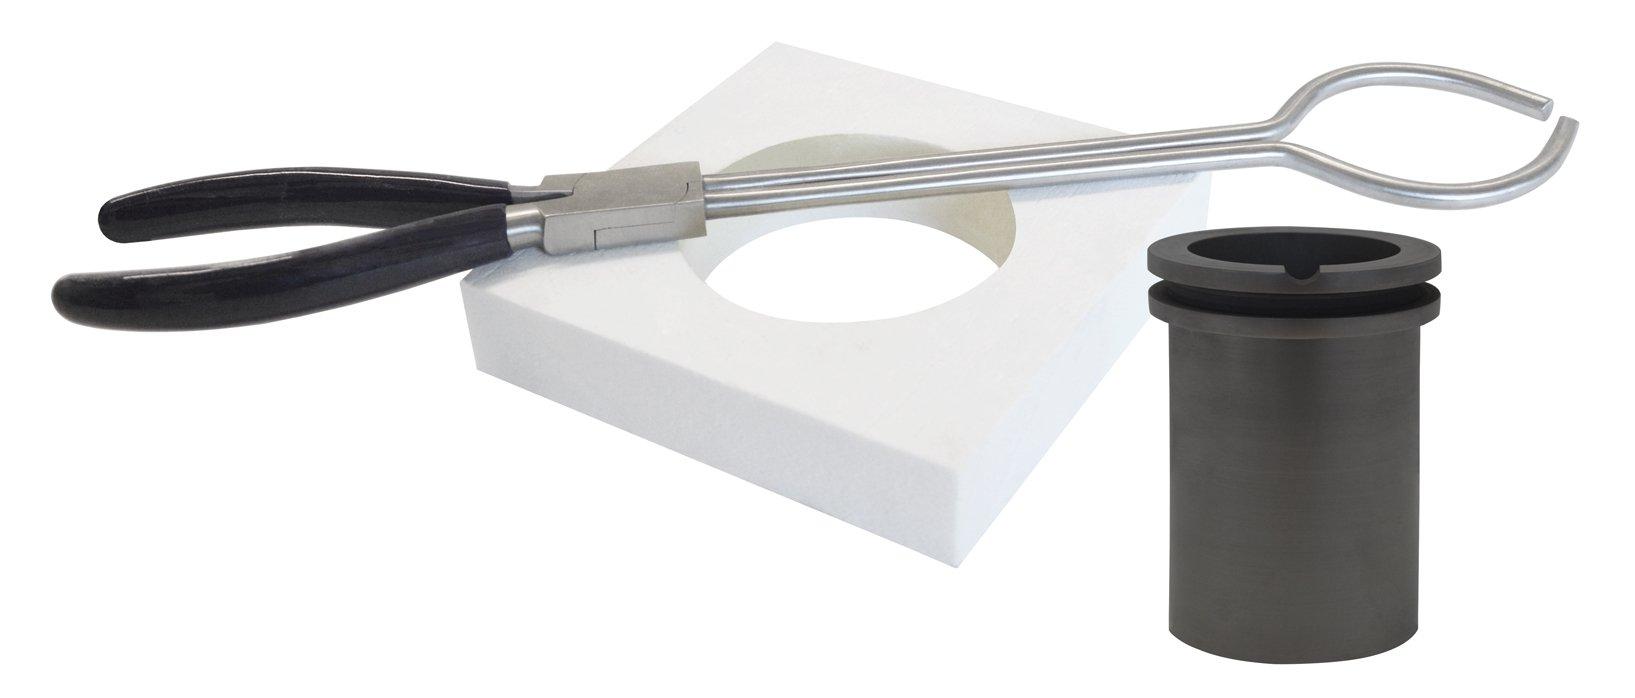 100 Oz Deluxe Tabletop QuikMelt Topper Kit Tongs Flange Crucible Jewelry Making Metal Furnace Kiln Tools